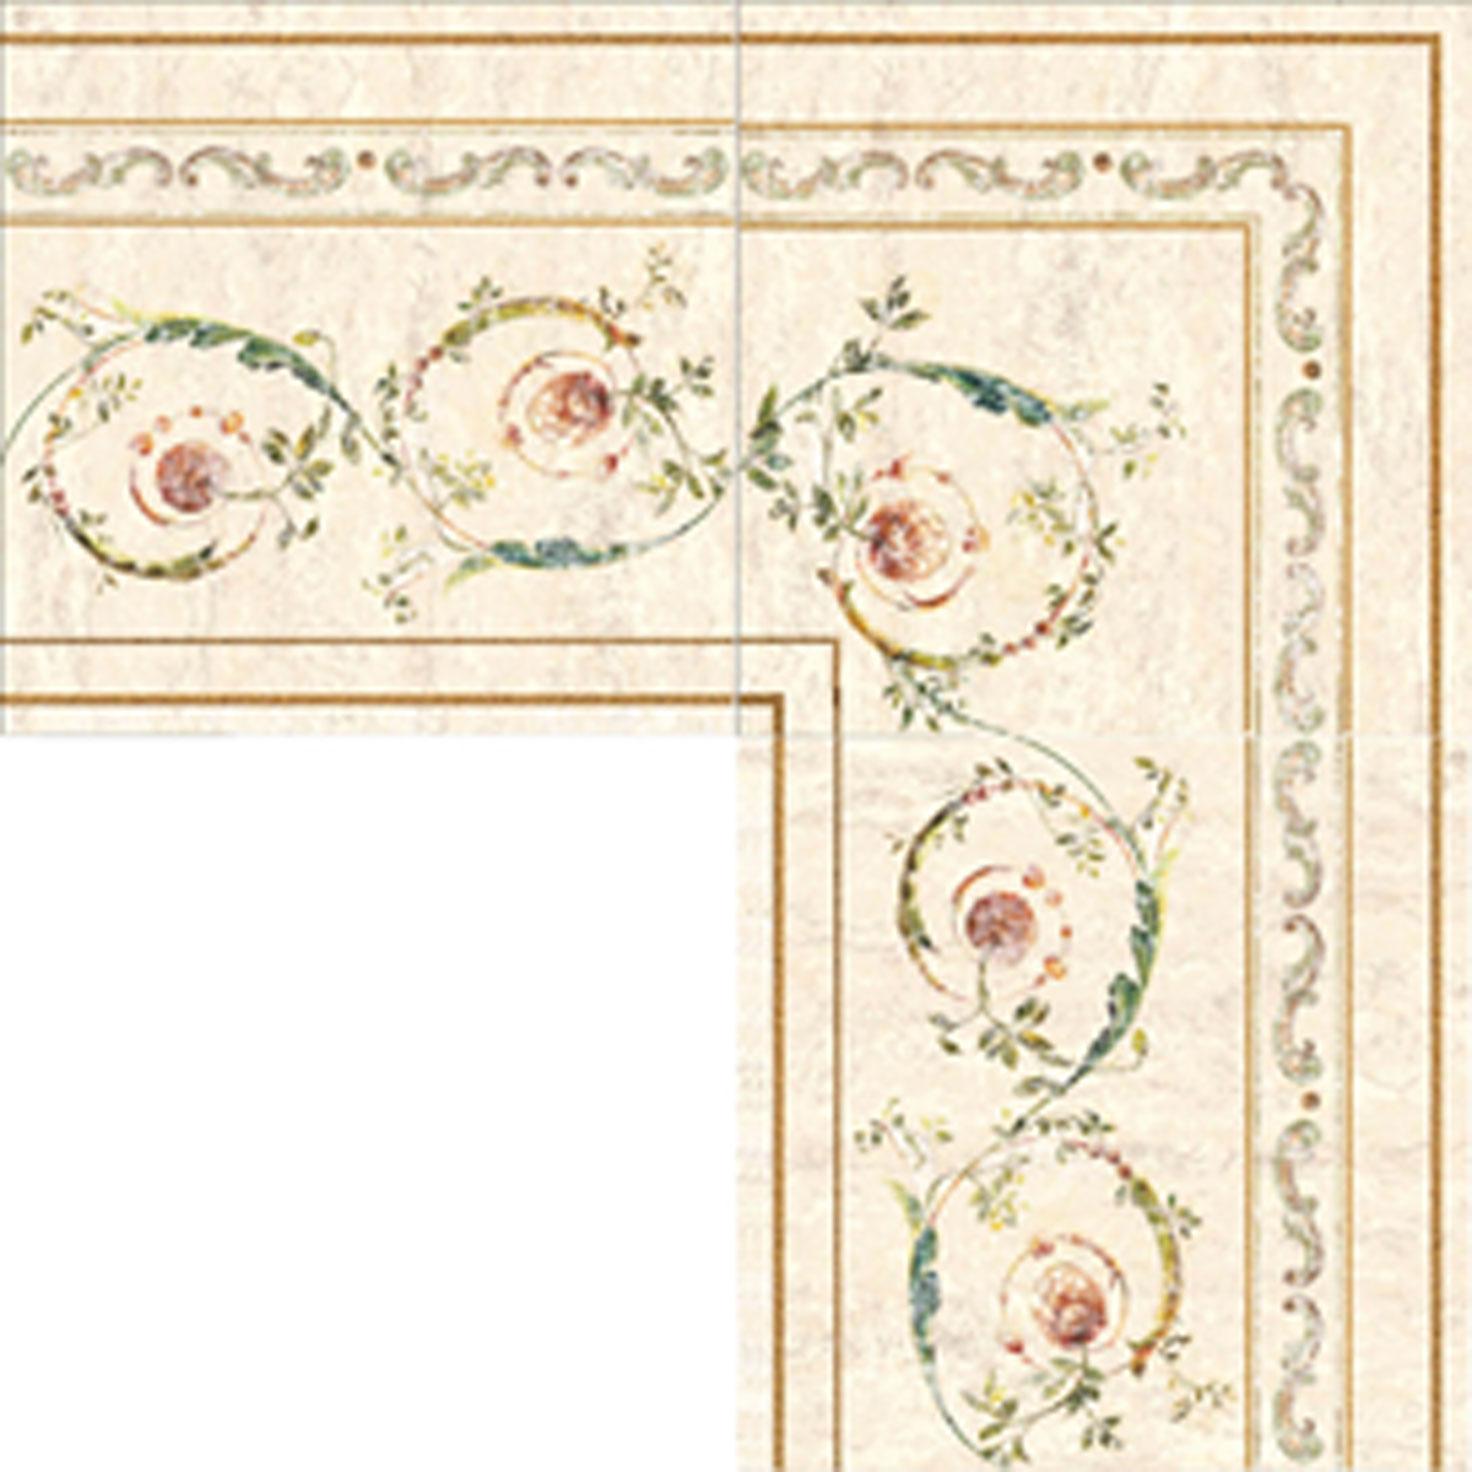 Affreschi Corte - Fascia 20x20, Ang. 20x20